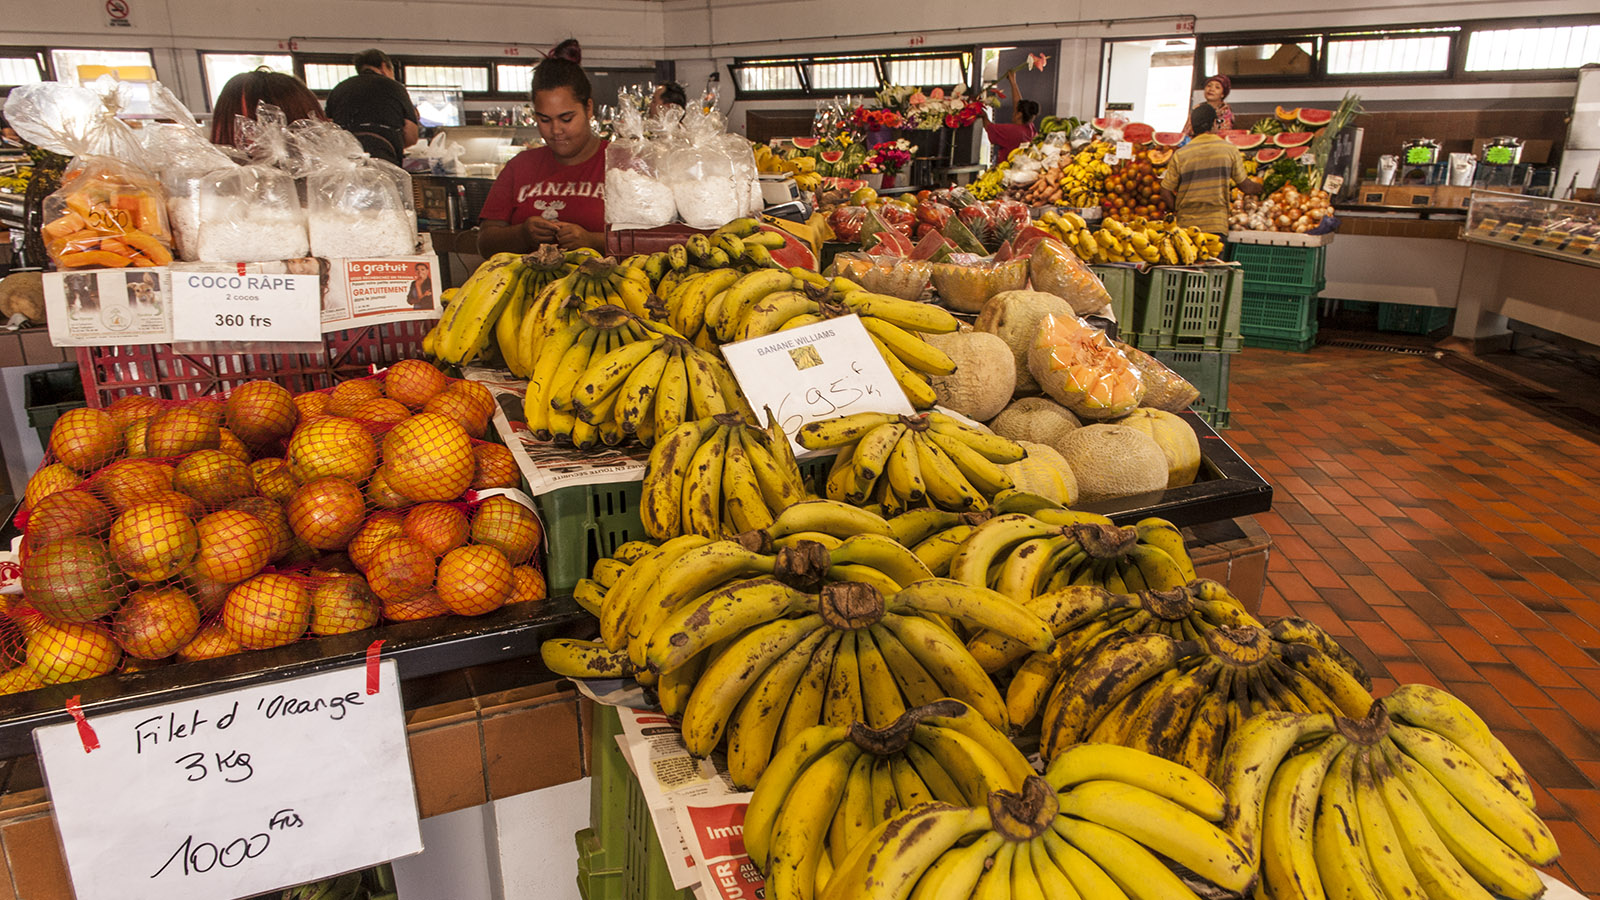 Marché de Nouméa: Bananen, Mango, Litchis und Papaya: Bei Obst gibt sich Neukaledonien ganz tropisch.